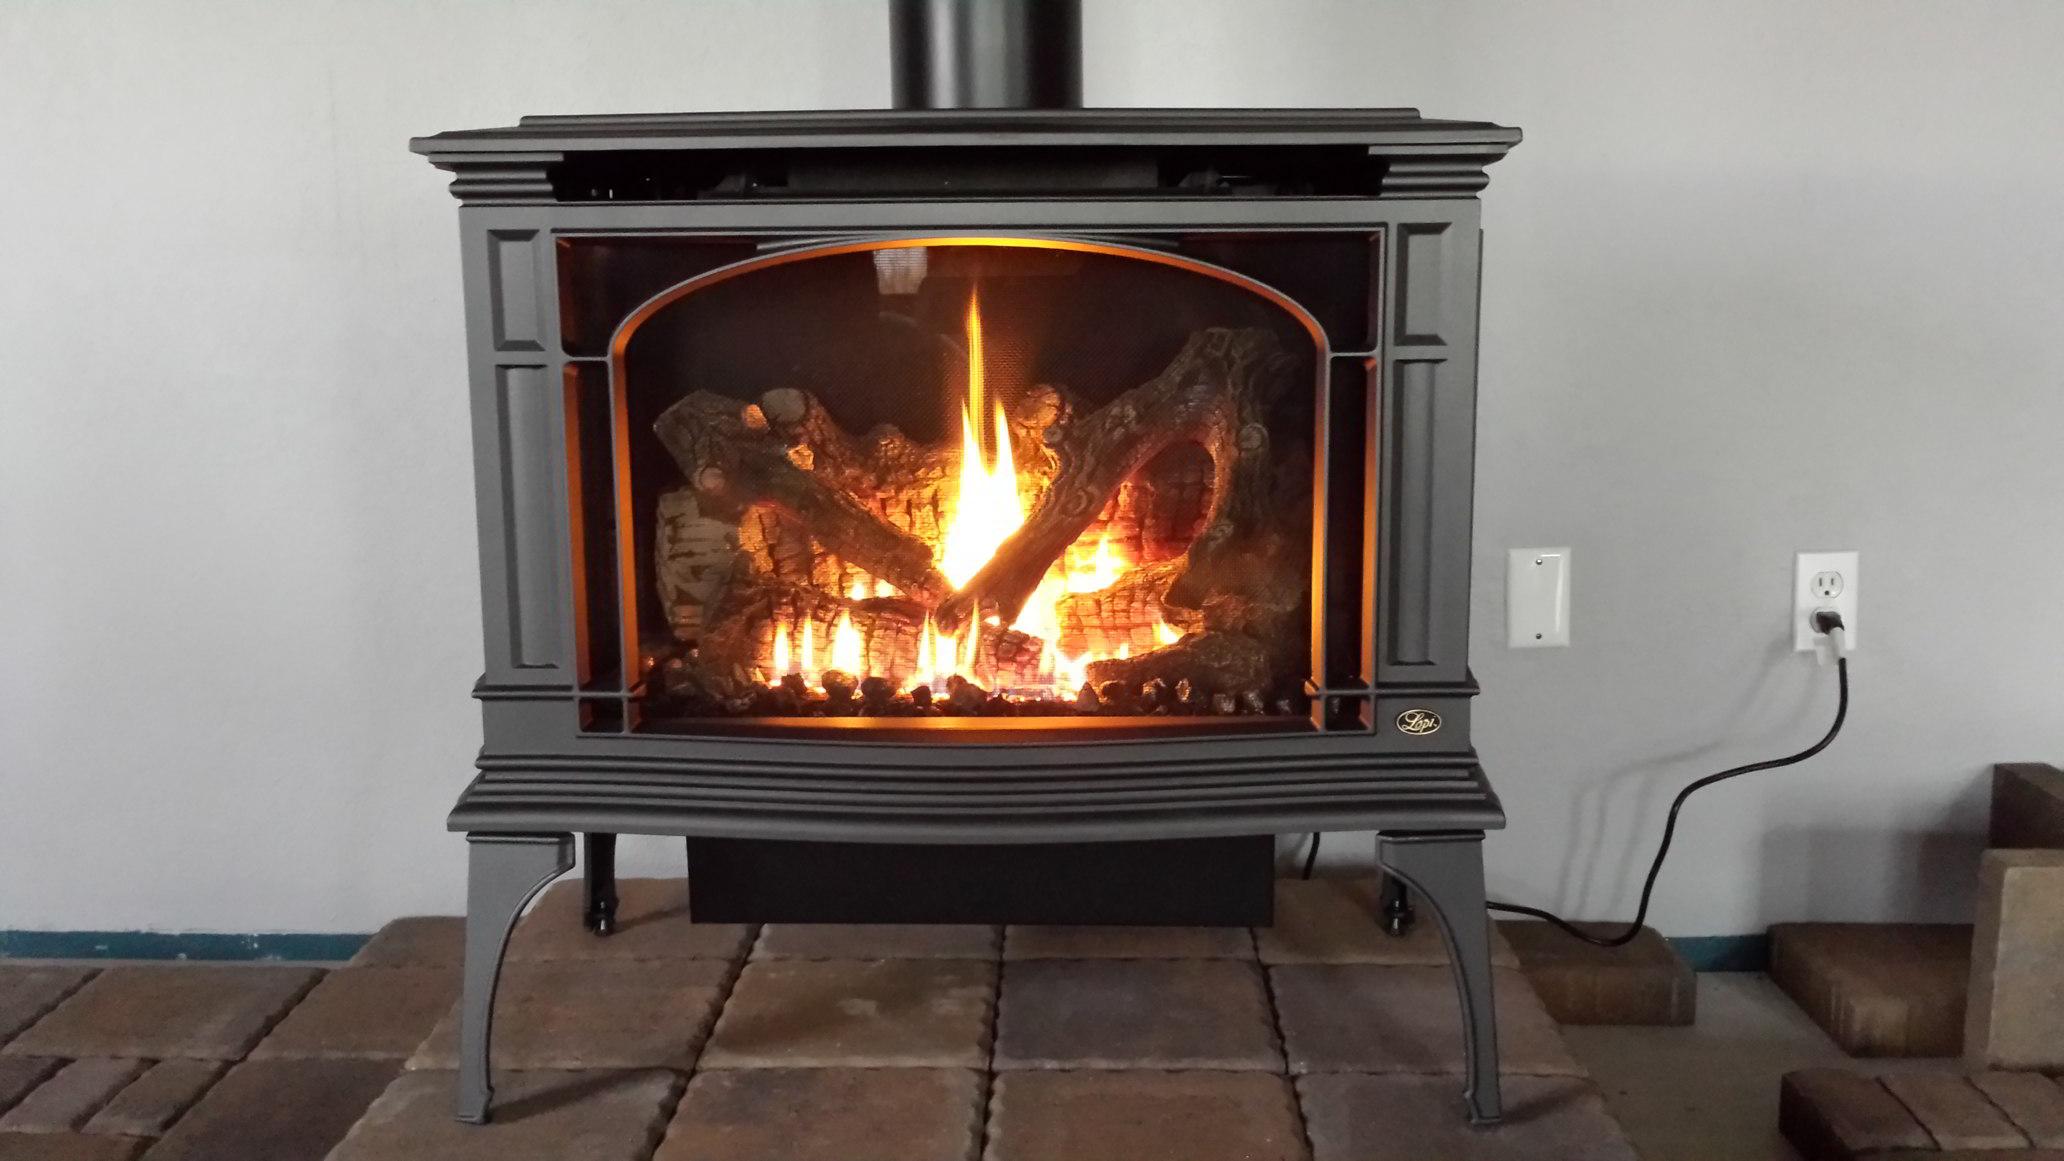 shangri-la-stove-spa-logo-1024x792